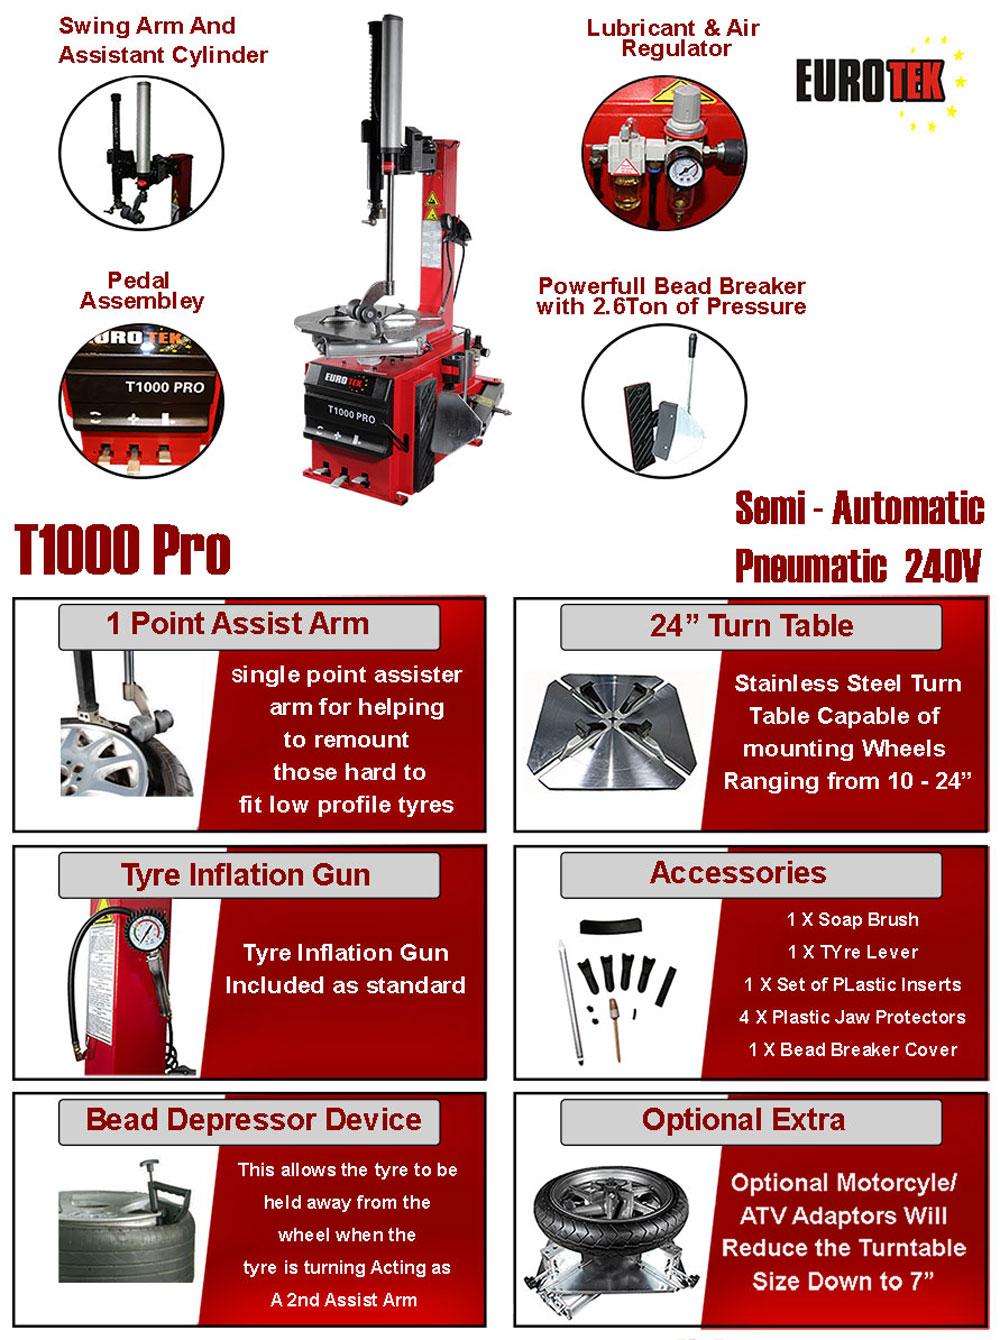 information flyer for Eurotek T1000 Pro tyre changer